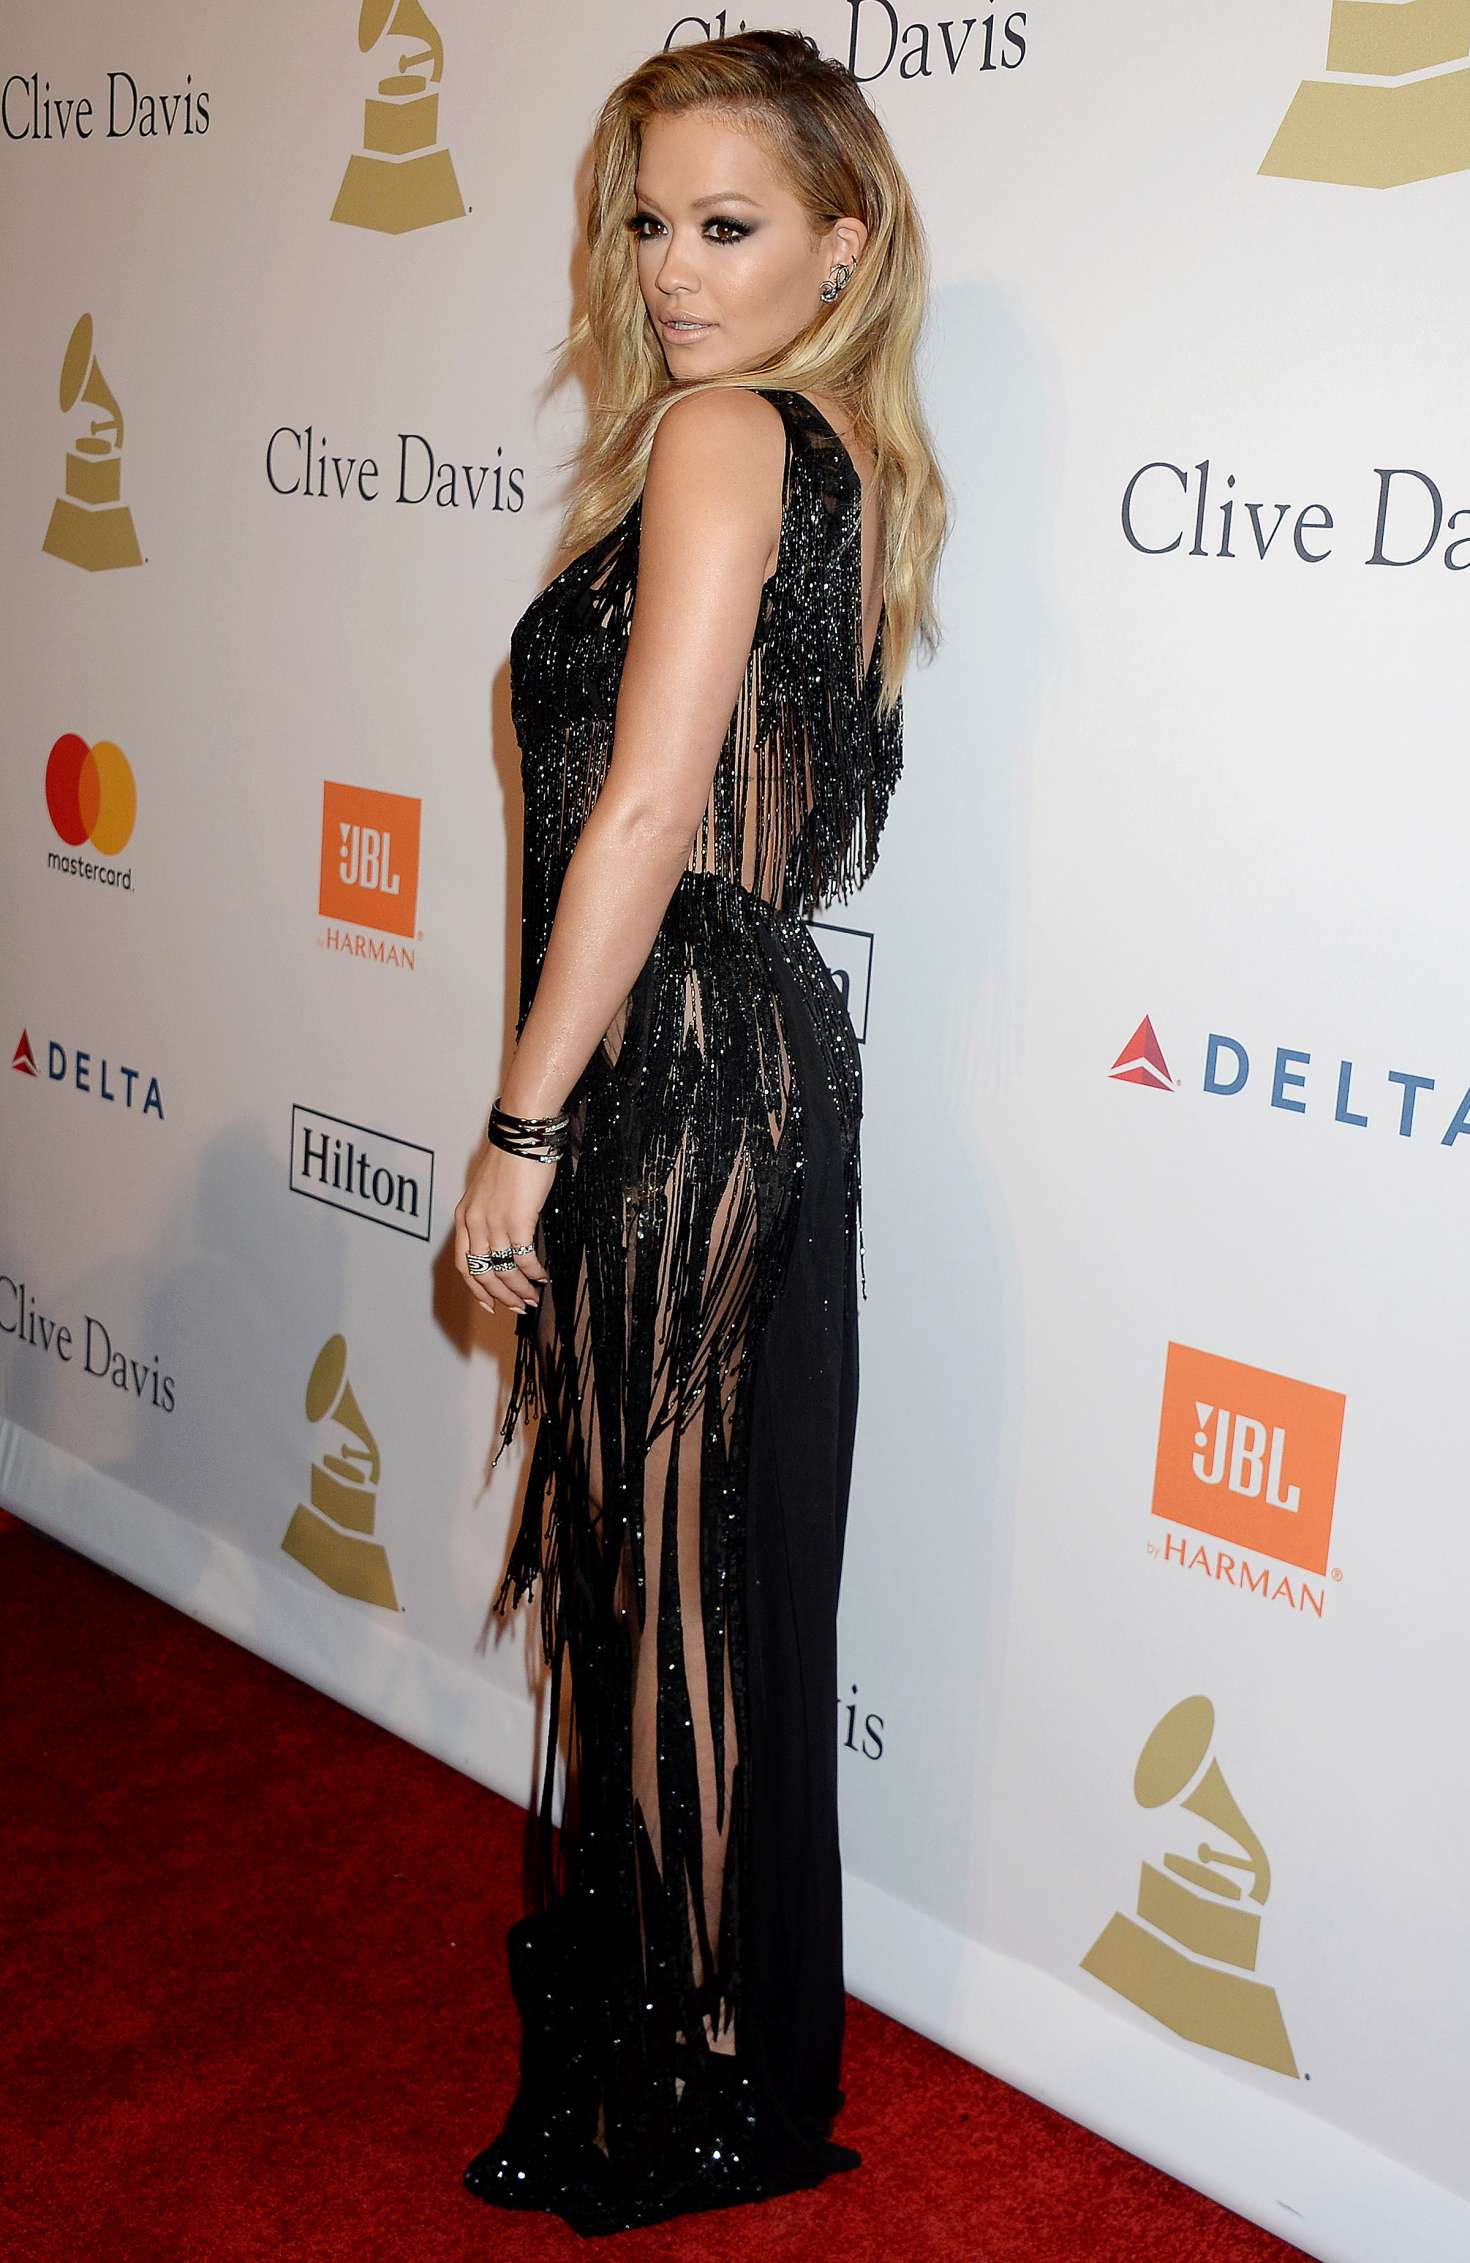 Rita Ora 2017 : Rita Ora: Clive Davis Pre-Grammy Party 2017 -01